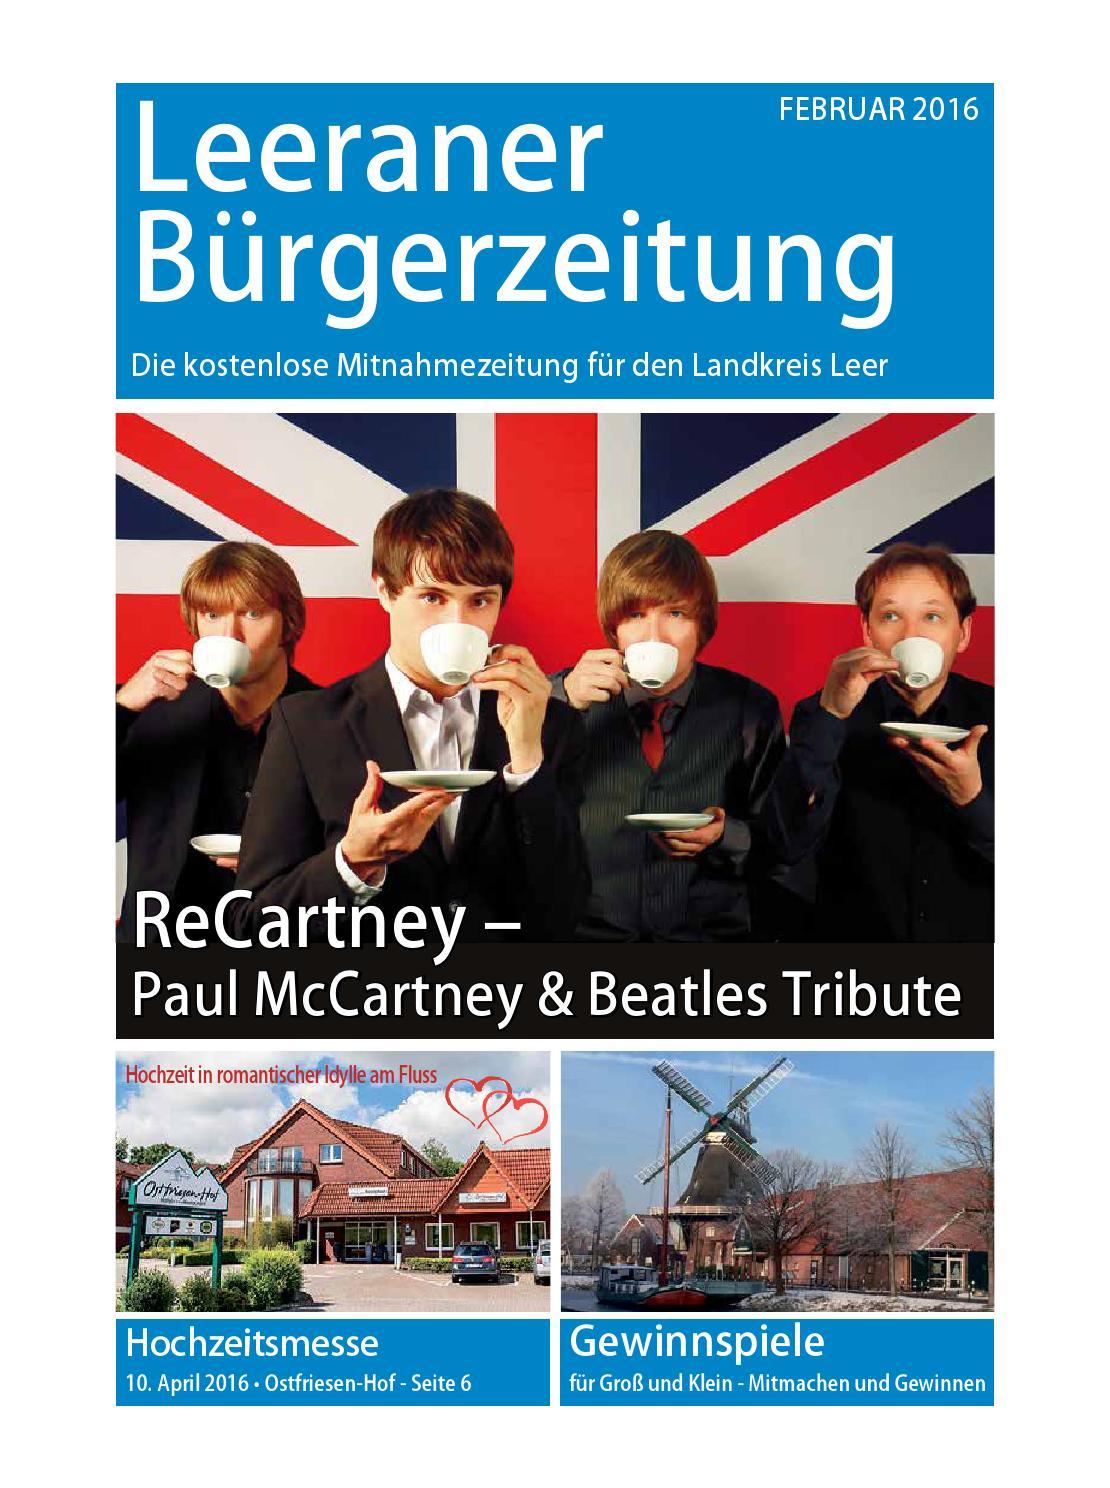 Leeraner Bürgerzeitung Februar 2016 by Ingo Buschmann - issuu